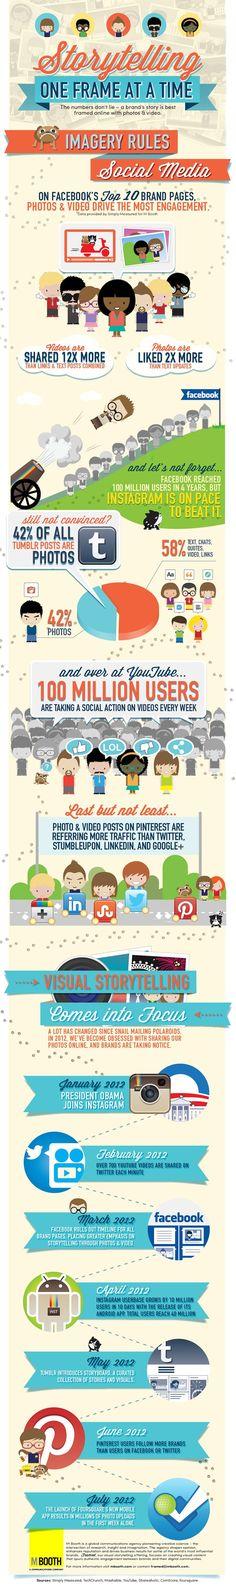 Pinterest keeps growing.